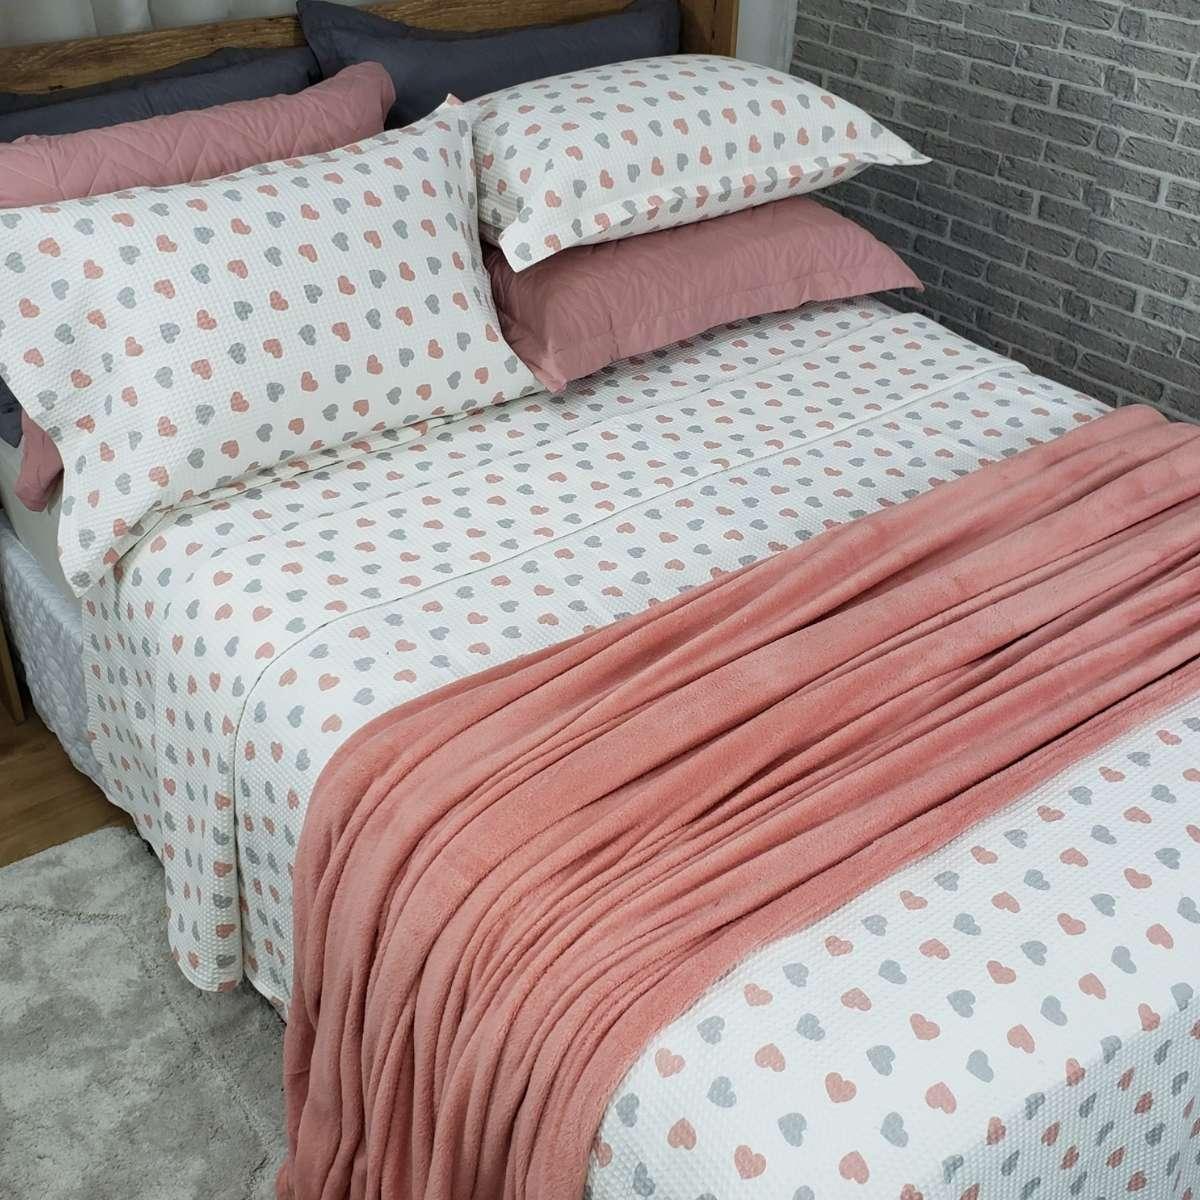 Manta Cobertor Sofisticata Queen 220x240 PESSEGO